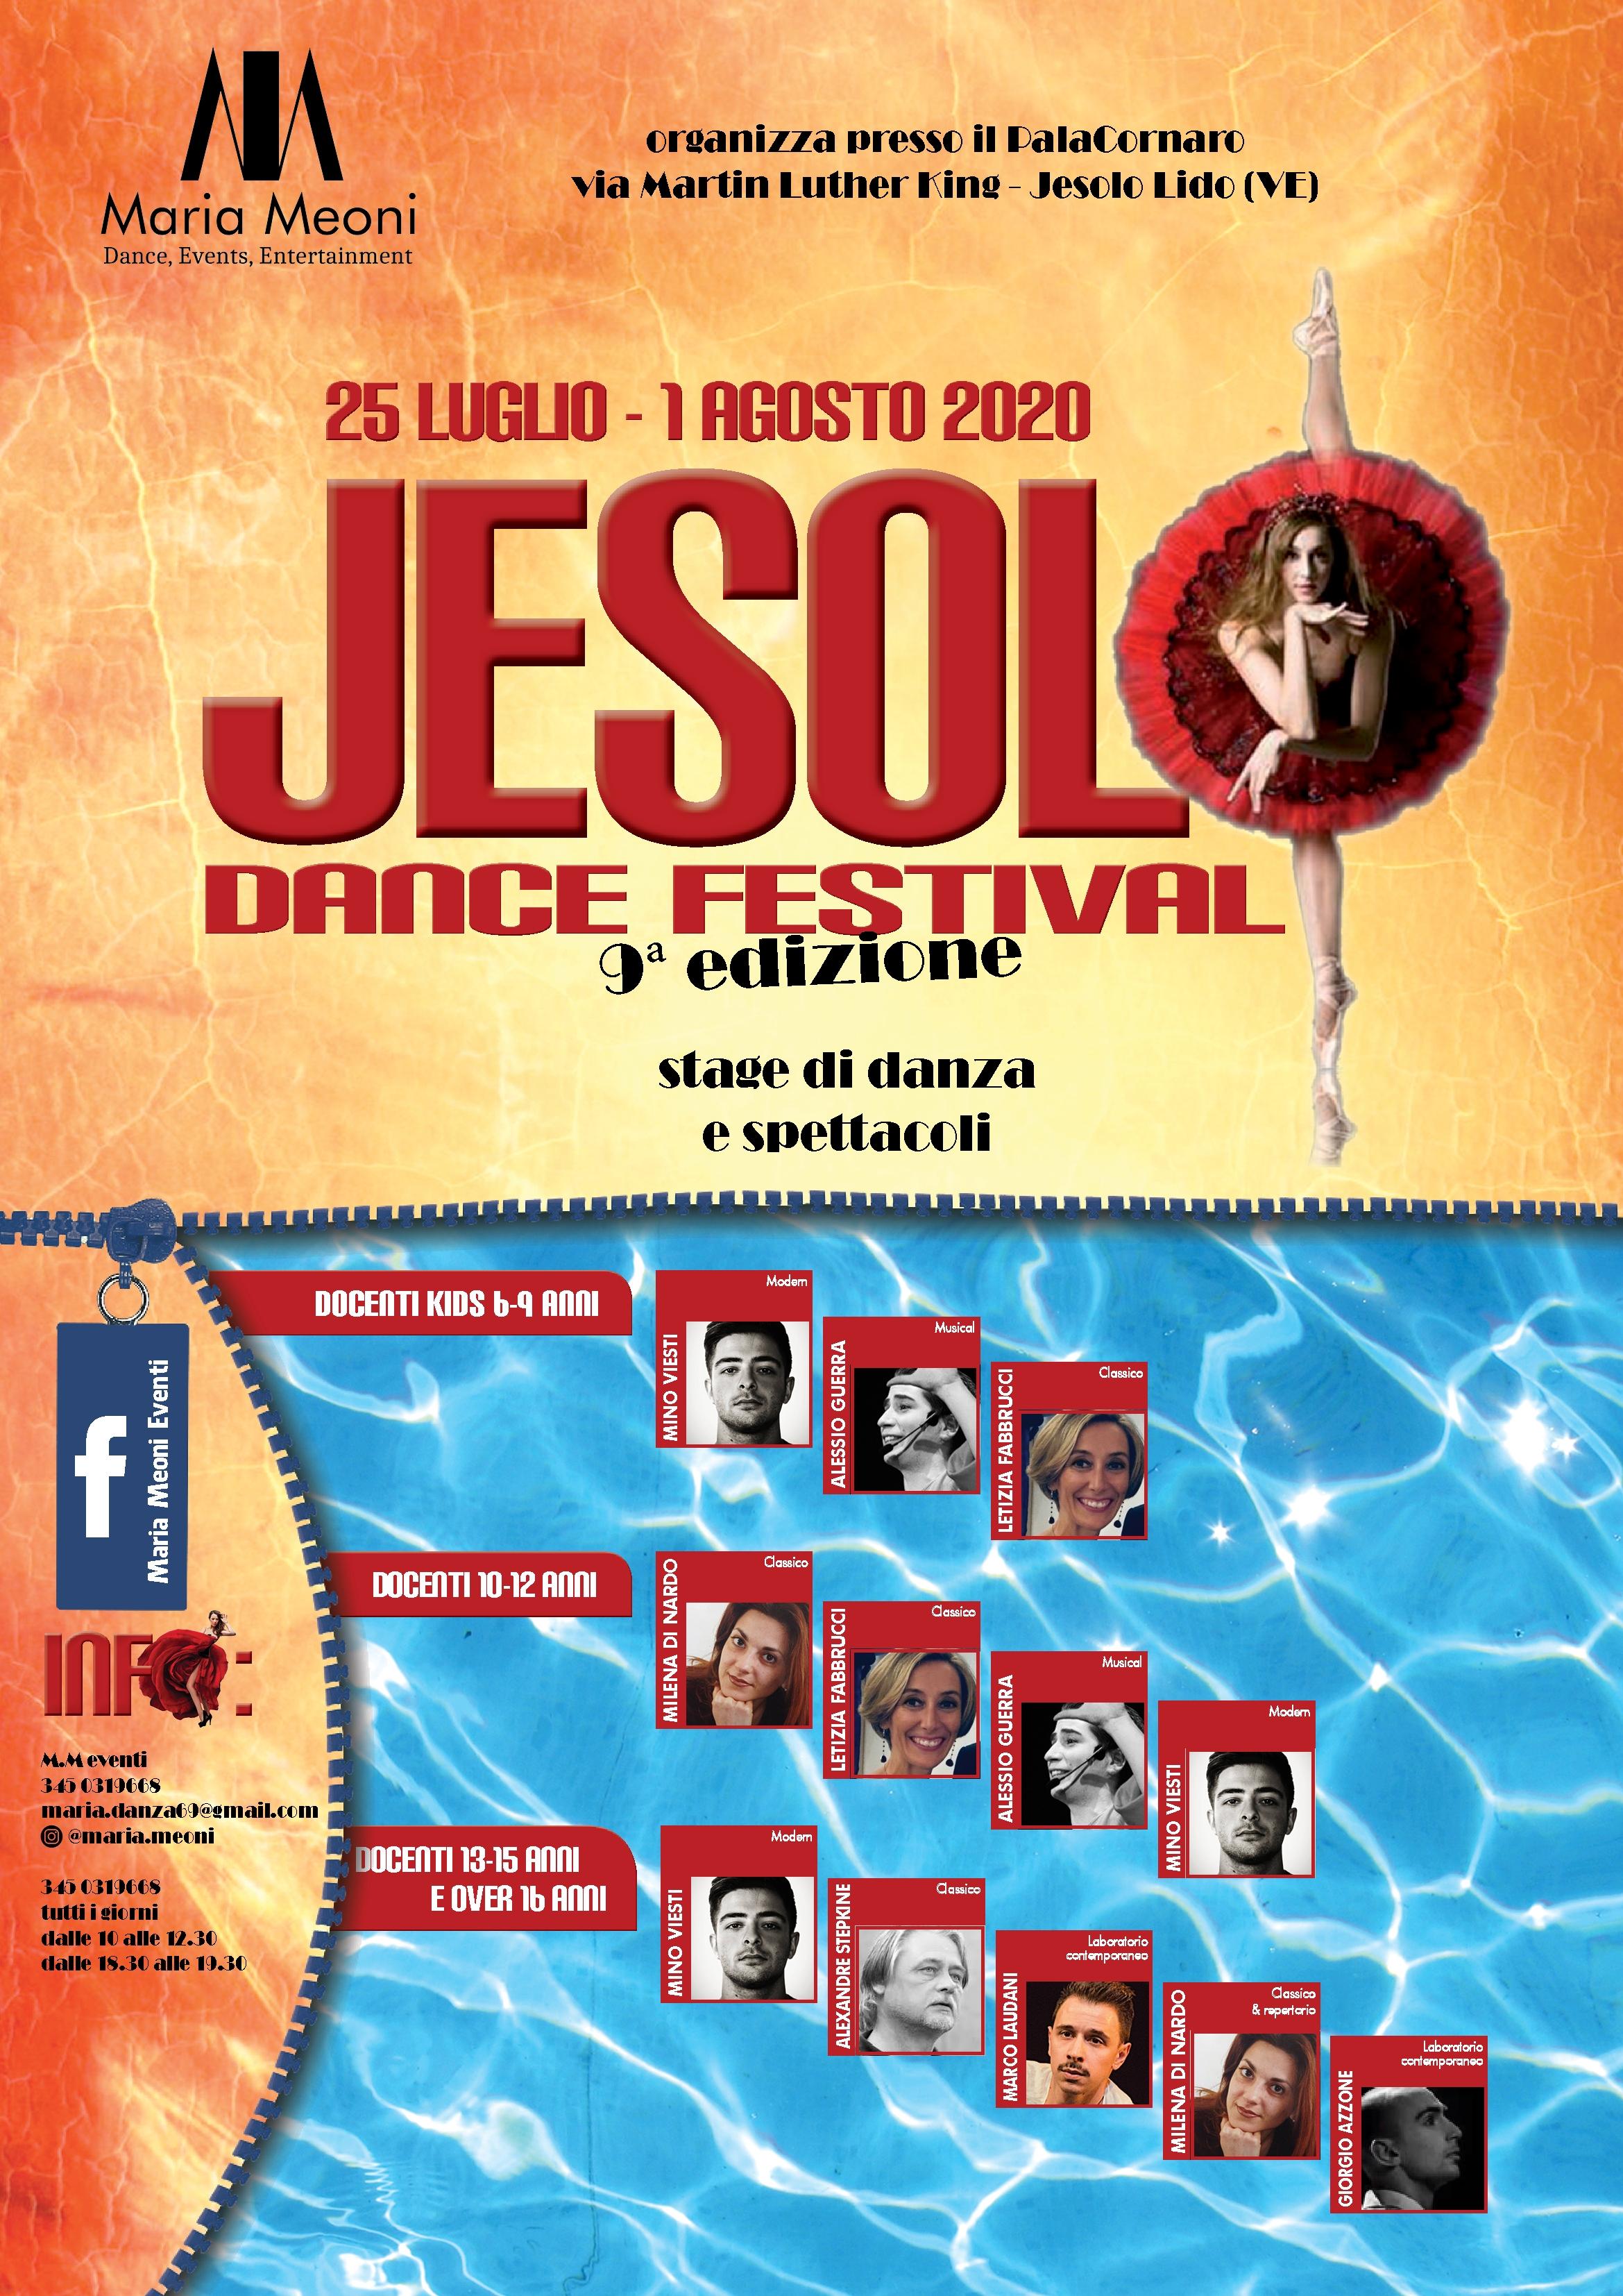 Jesolo Dance Festival 2020